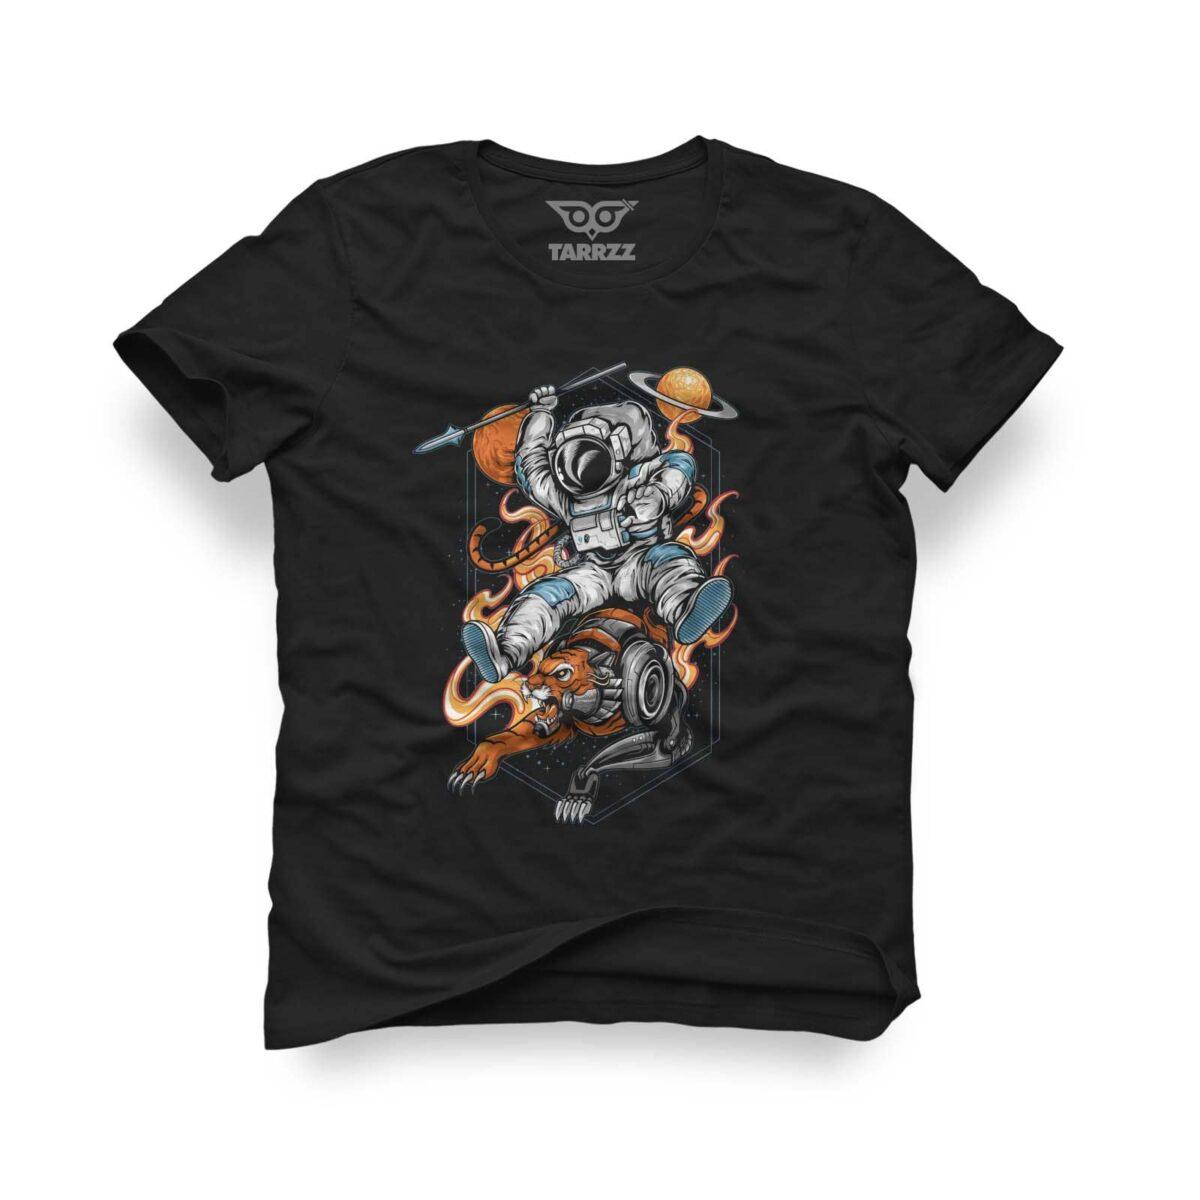 tarrzz-tasarim-siyah-tisort-aslanli-astronot